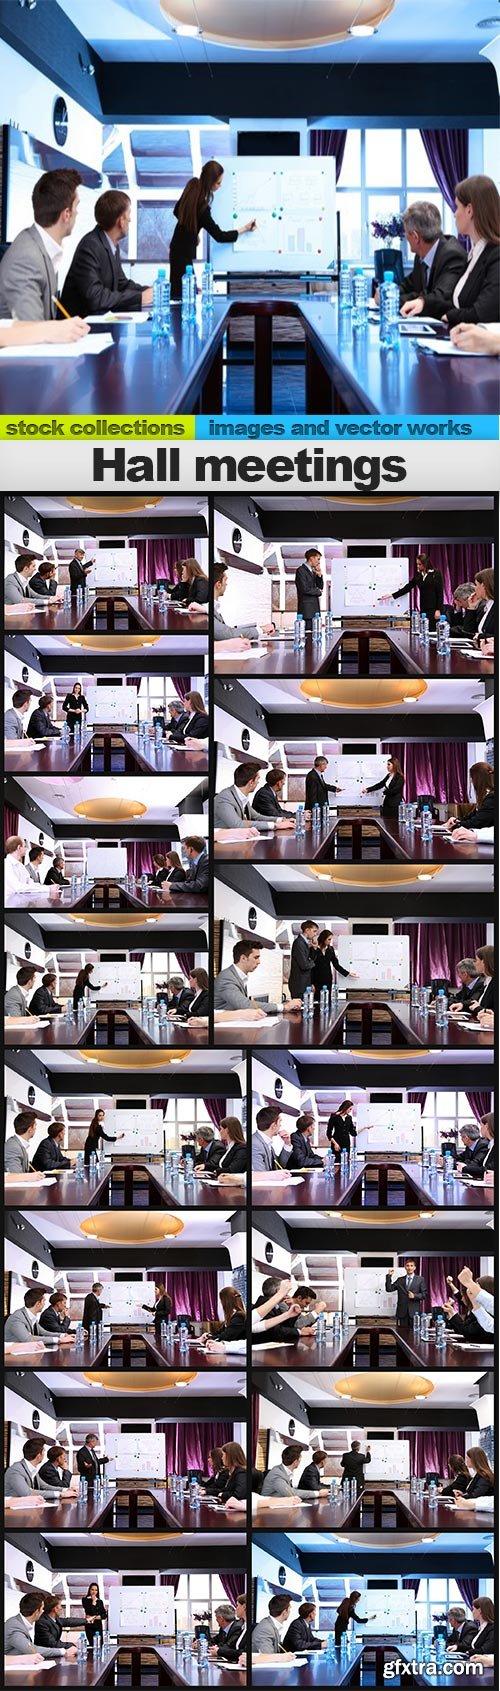 Hall meetings, 15 x UHQ JPEG